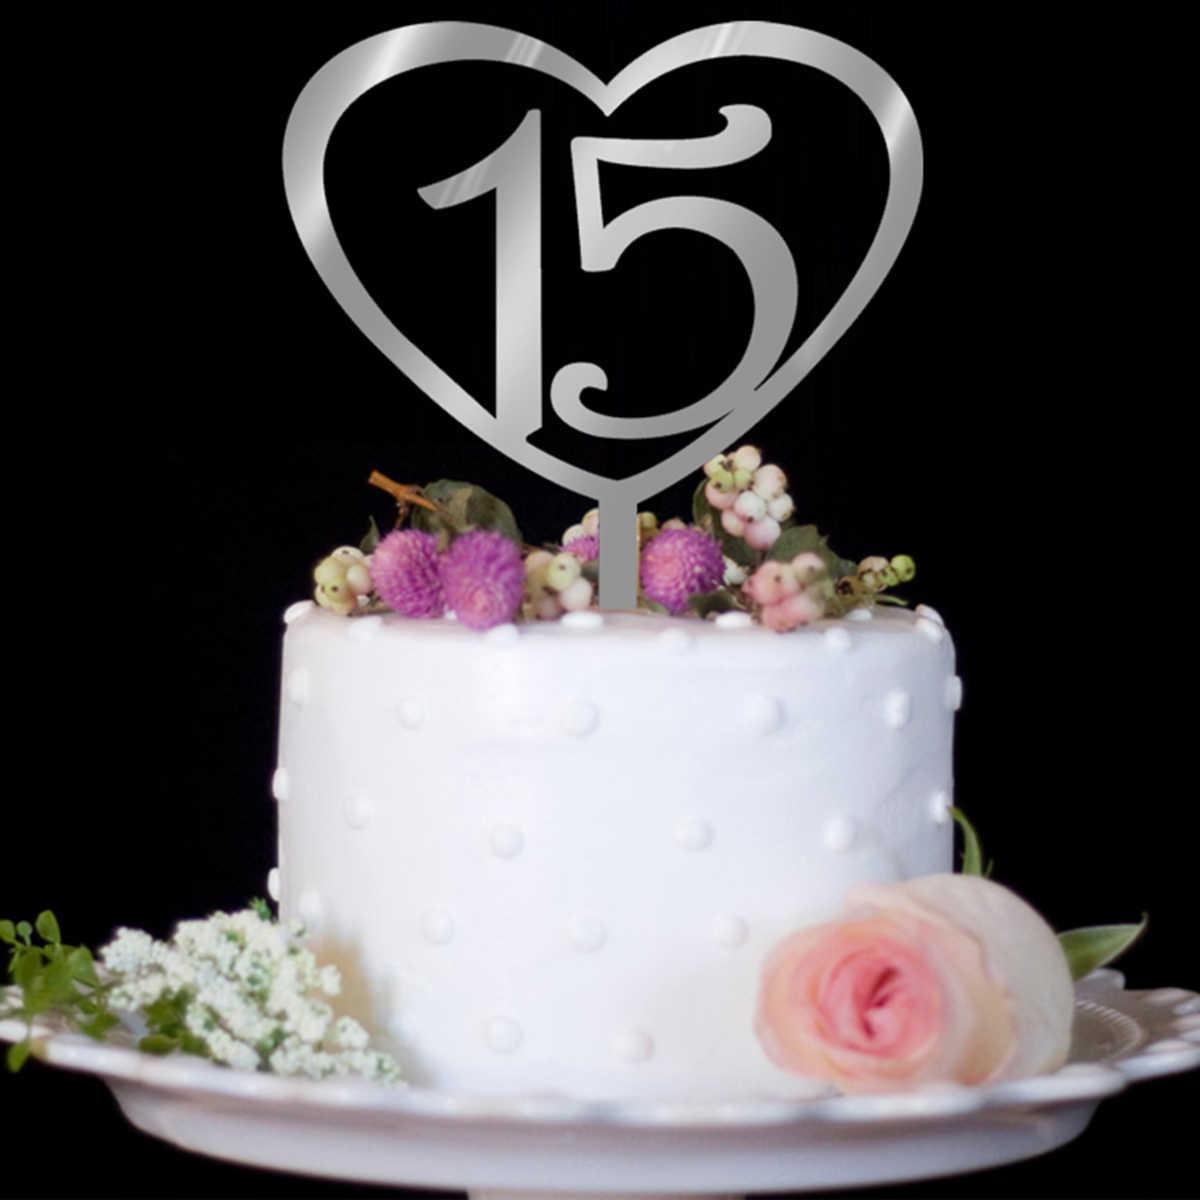 Tremendous Nicexmas Number 15 Cake Topper Love Heart Shape Acrylic Cupcake Personalised Birthday Cards Veneteletsinfo